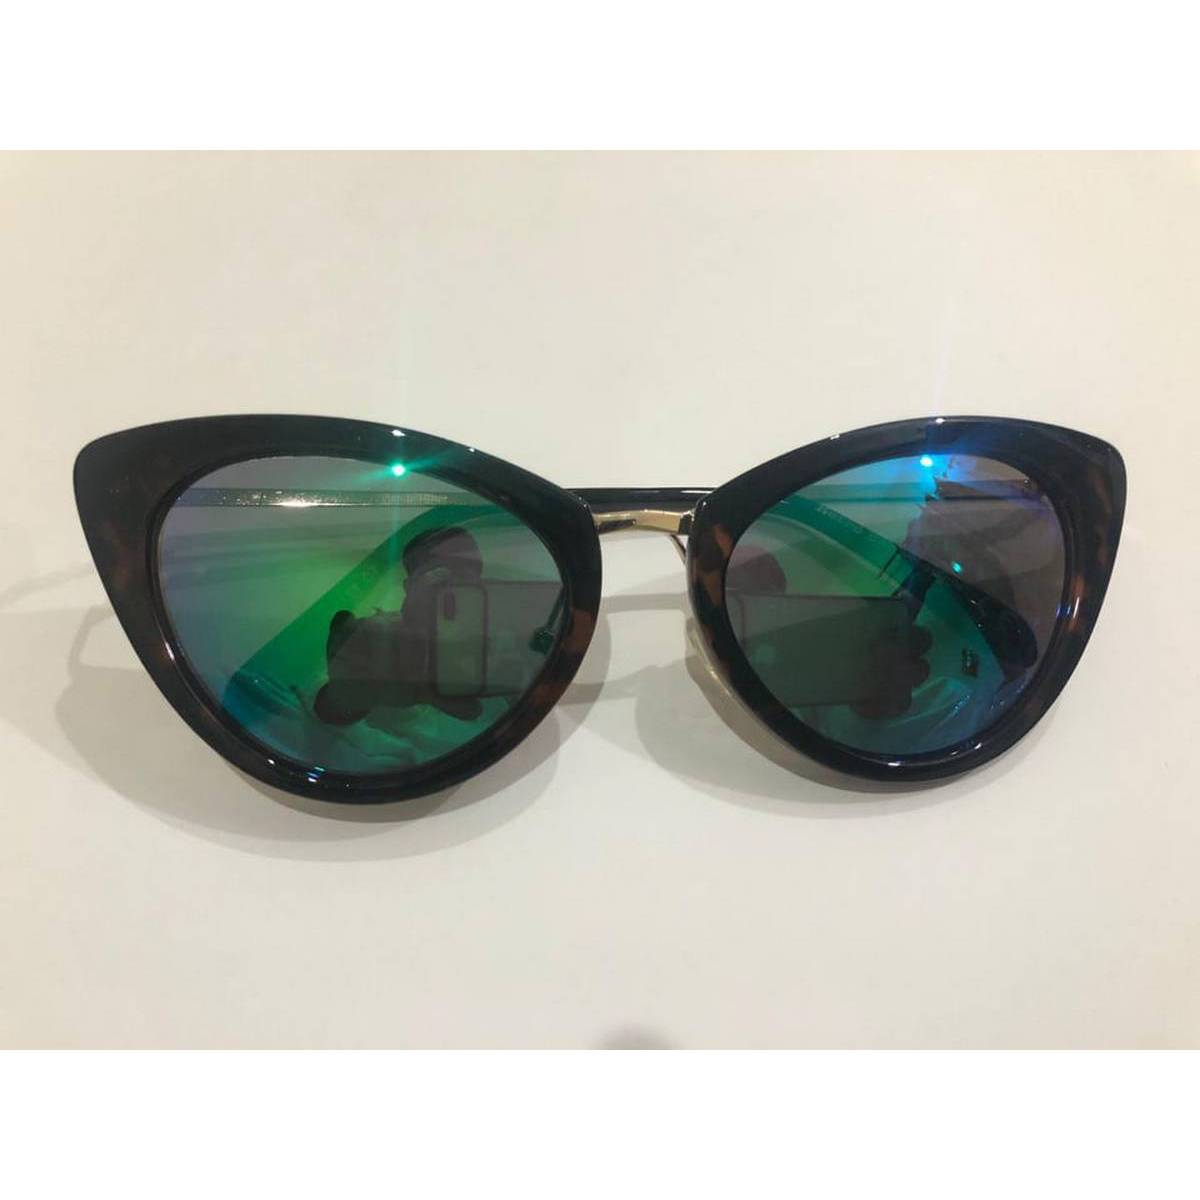 Ladies Sunglasses - Women Fashion - Round Sun glasses for Women - Girls Sun glasses - Big Sunglasses for Girls